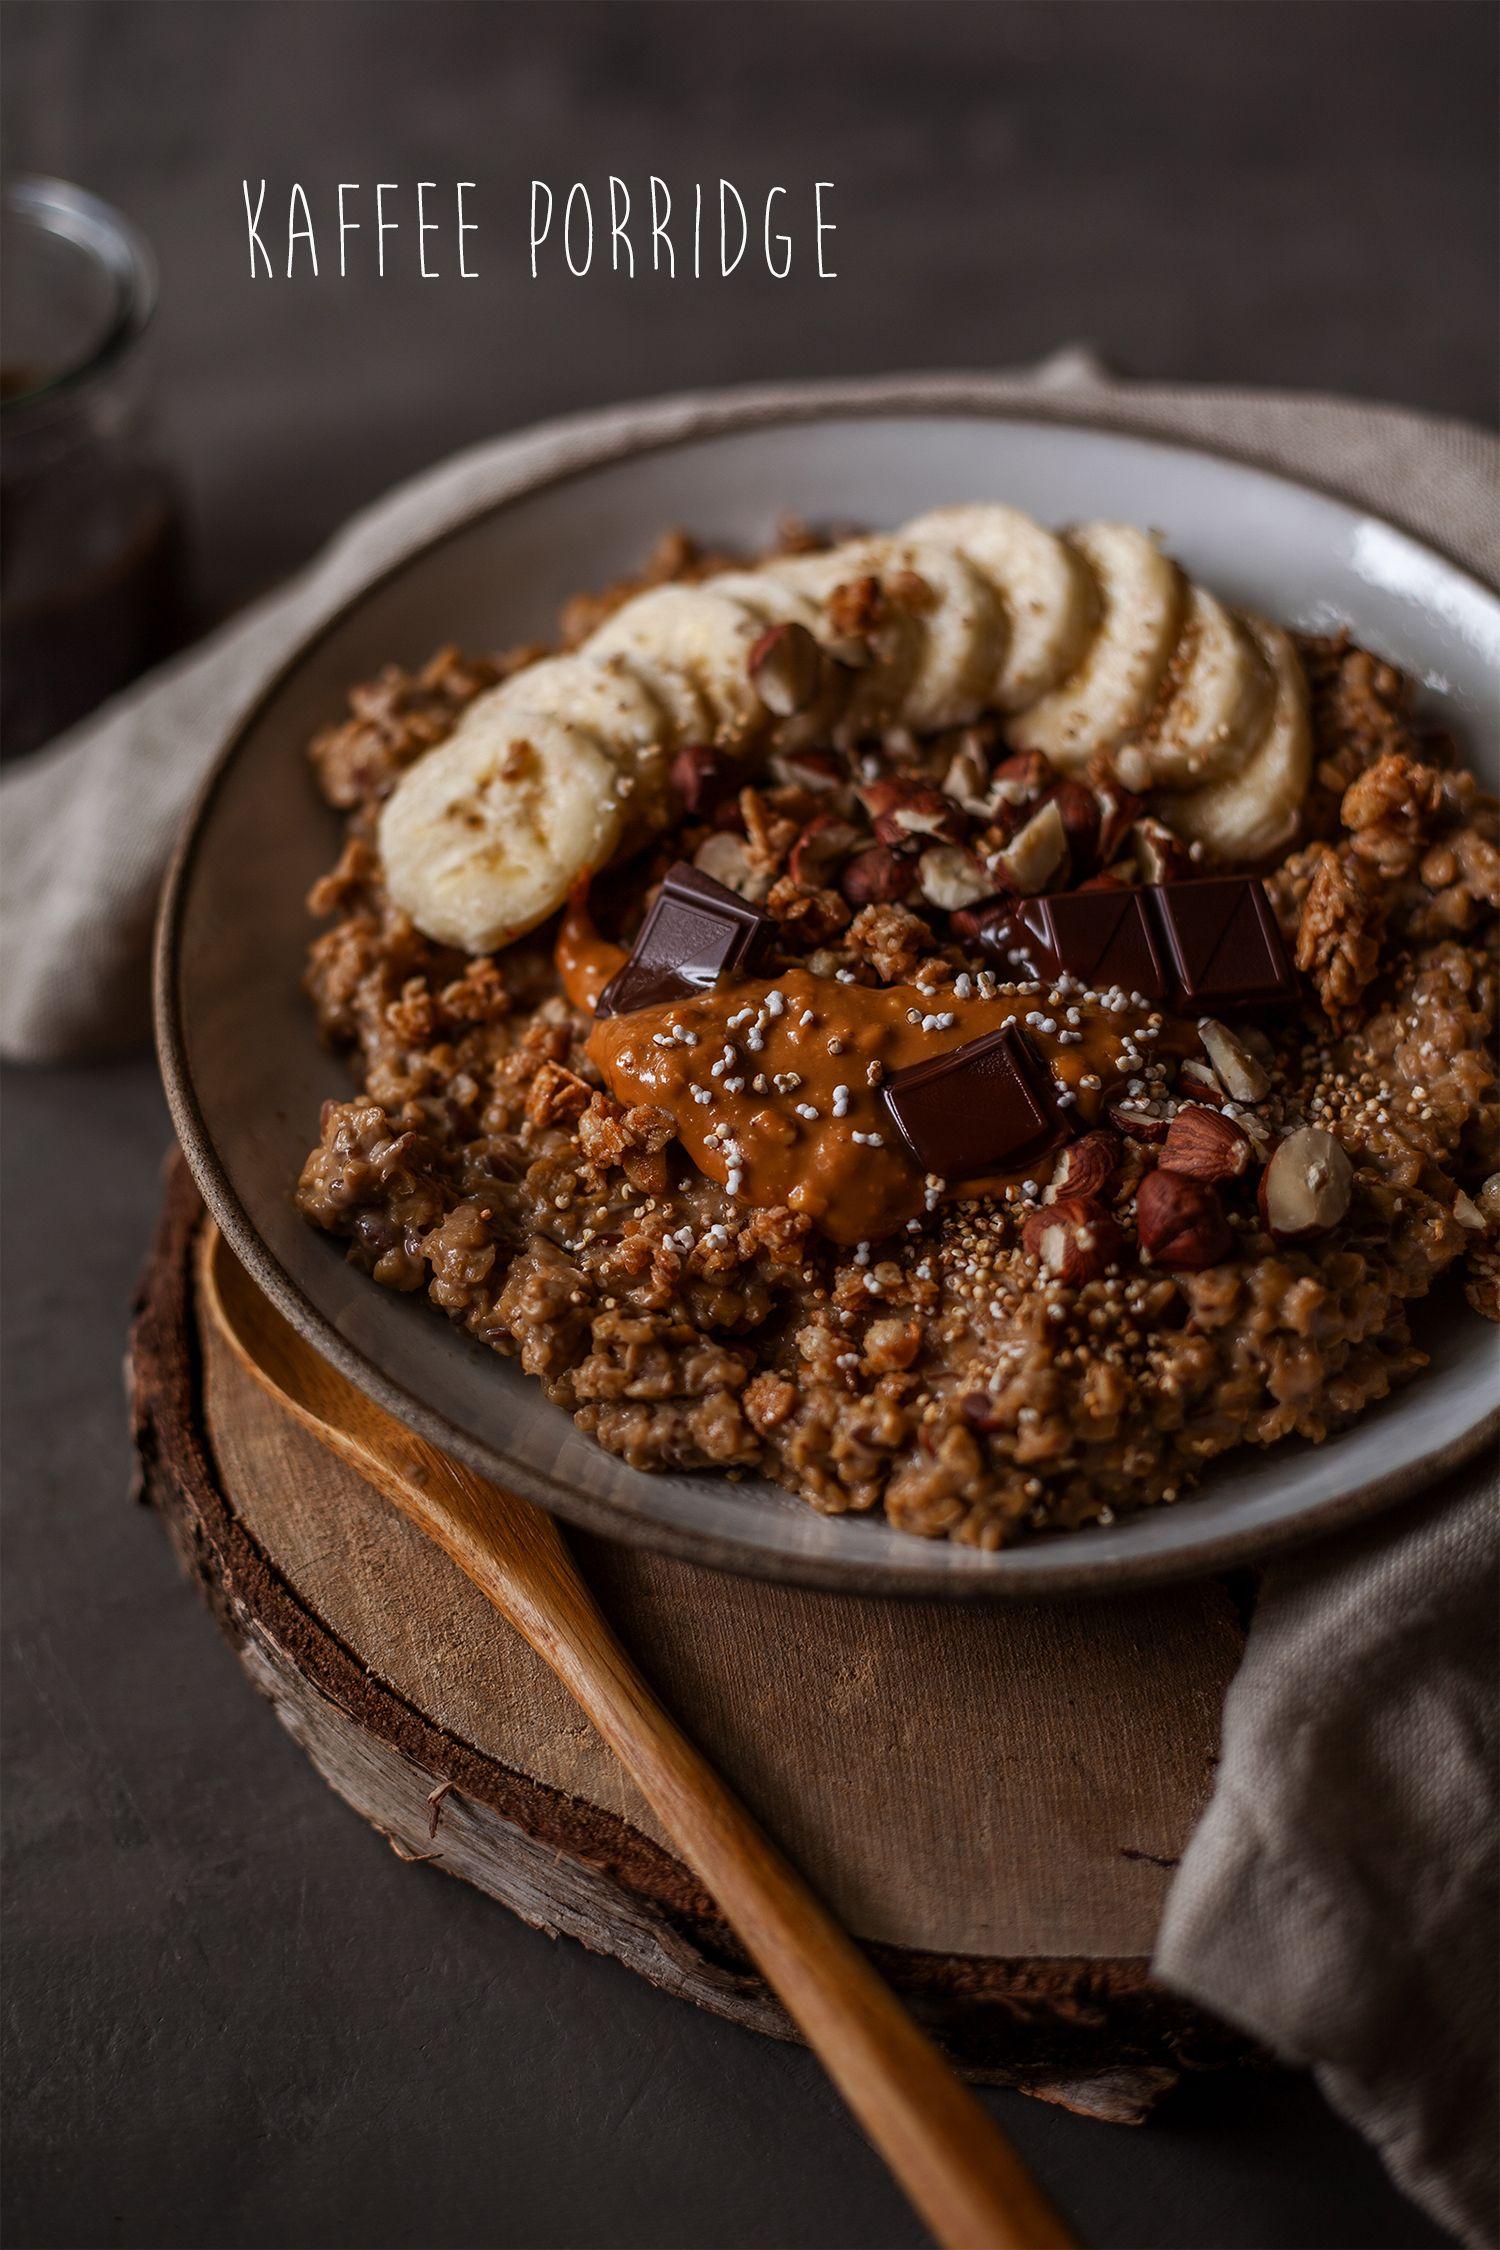 Photo of Warm coffee porridge with chocolate and peanut